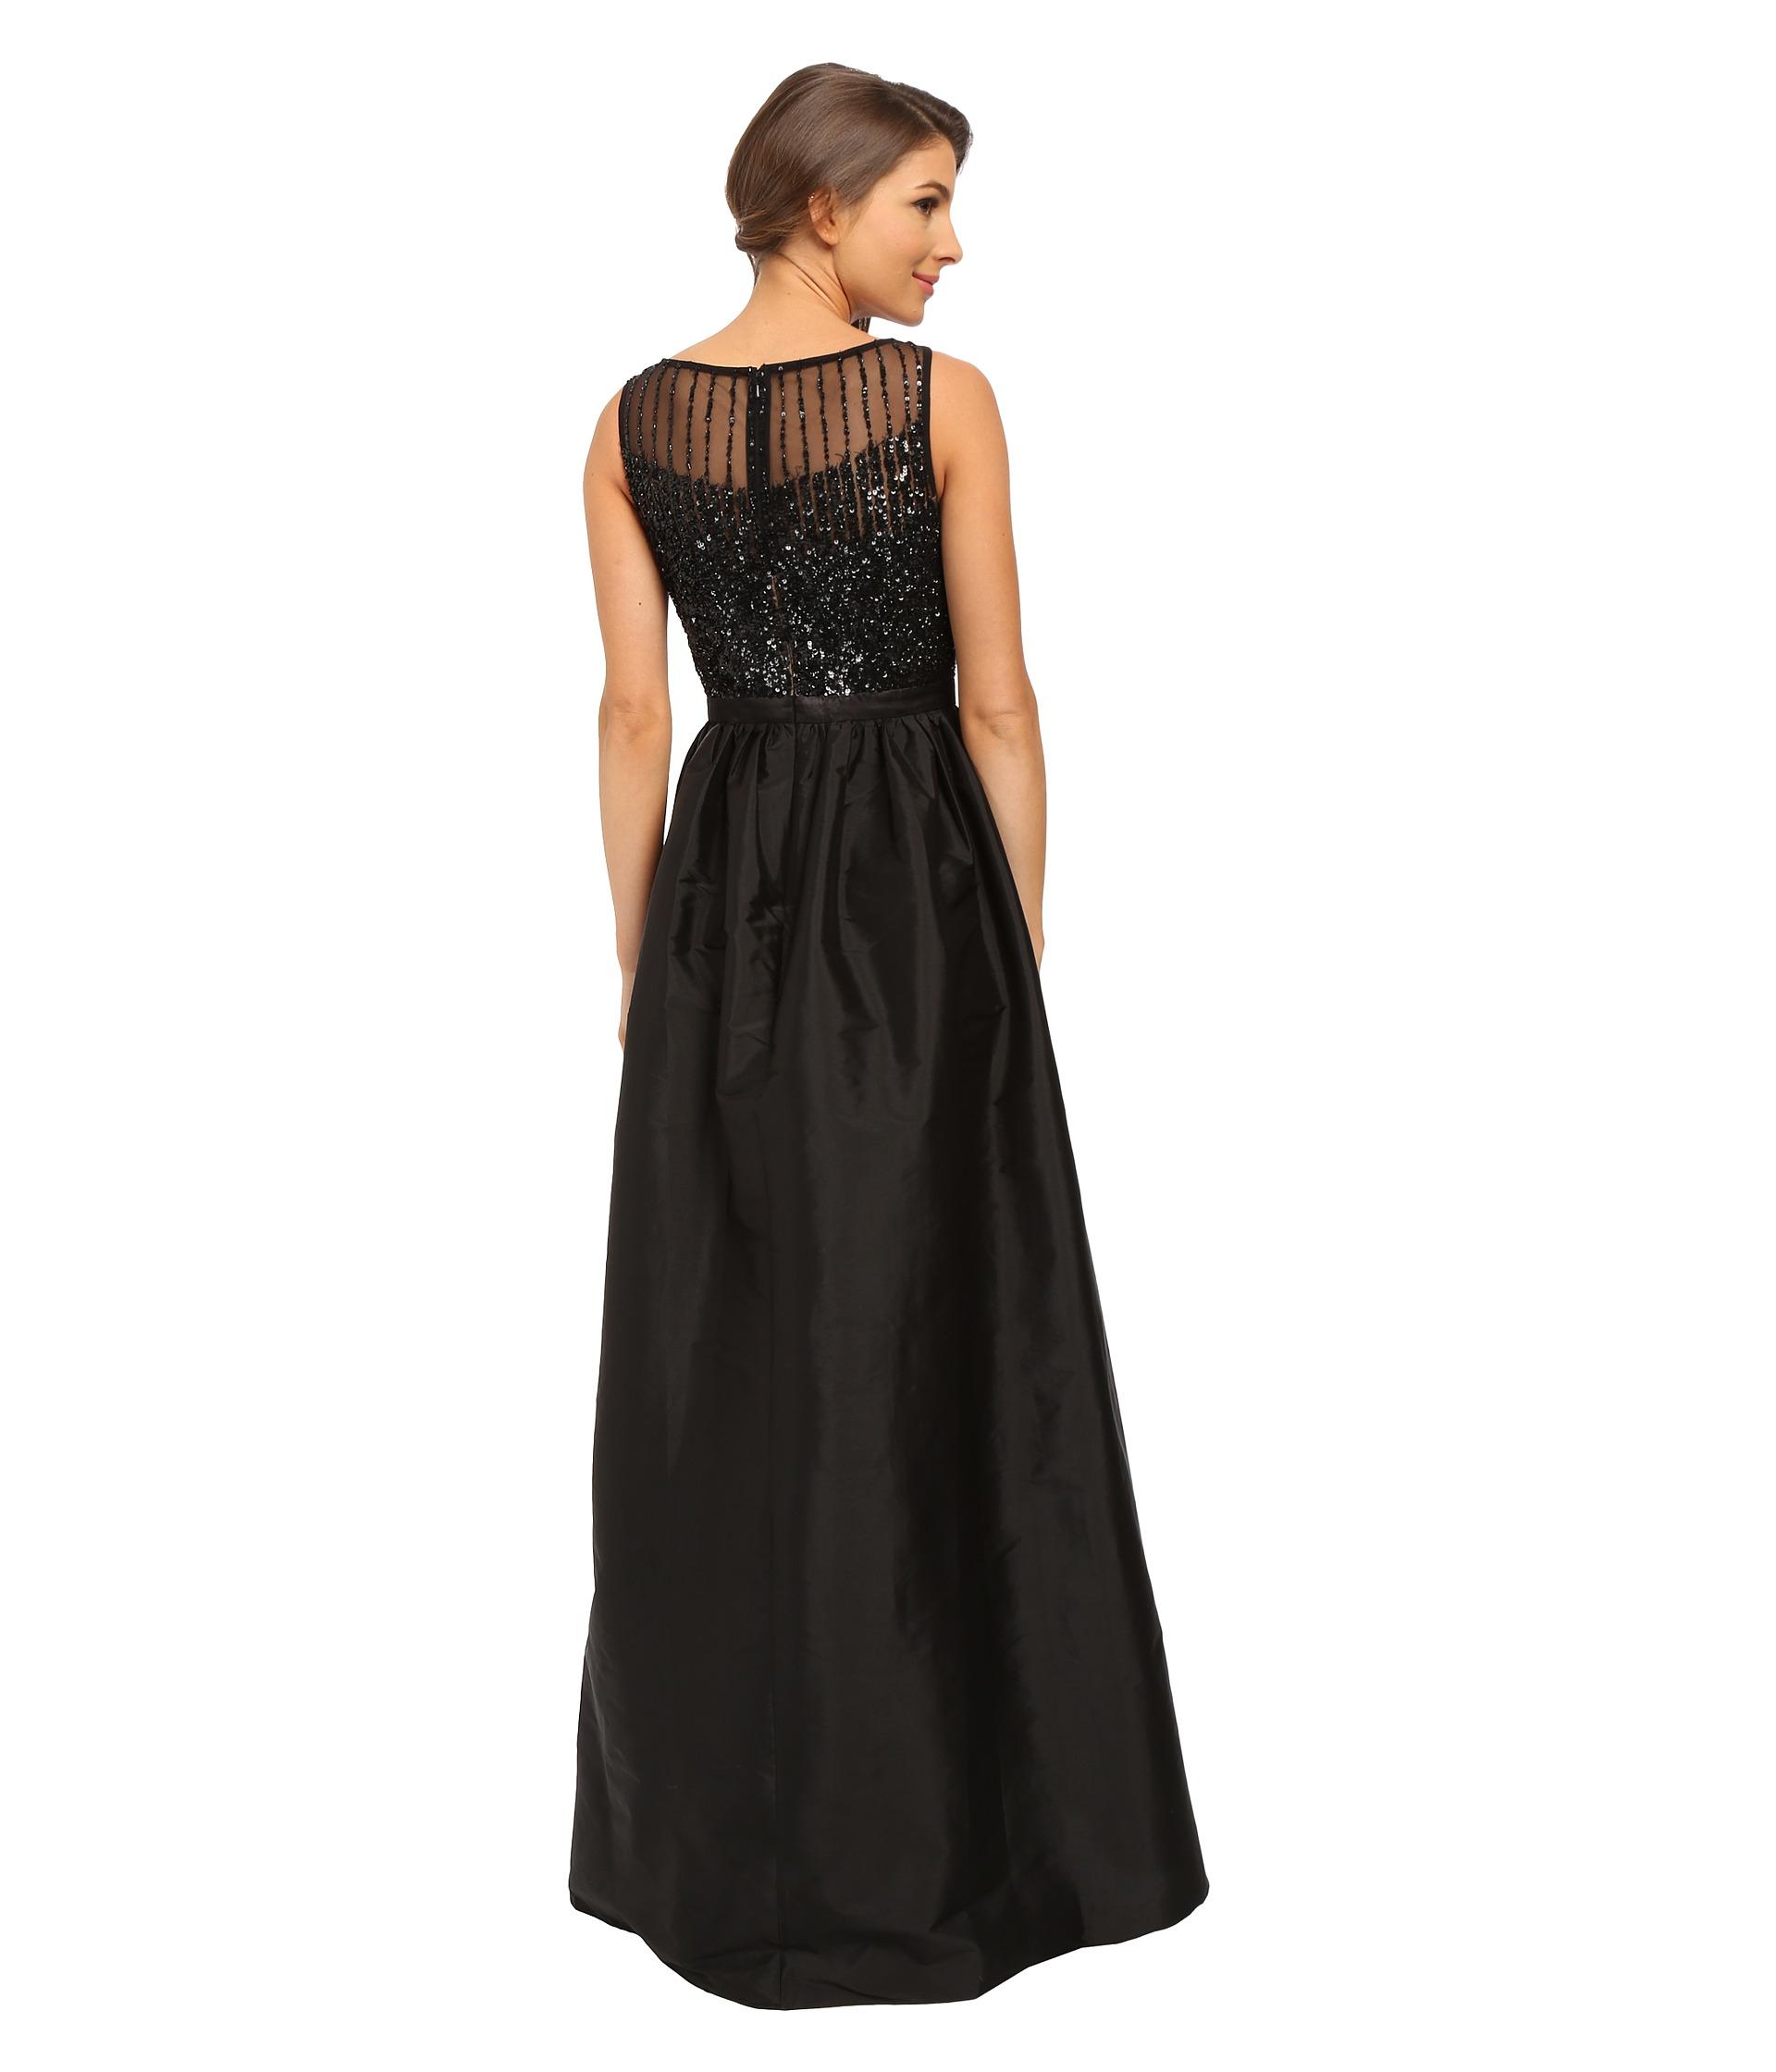 fa846eac17368 Adrianna Papell - Black Sleeveless Beaded Bodice Taffeta Ball Gown - Lyst